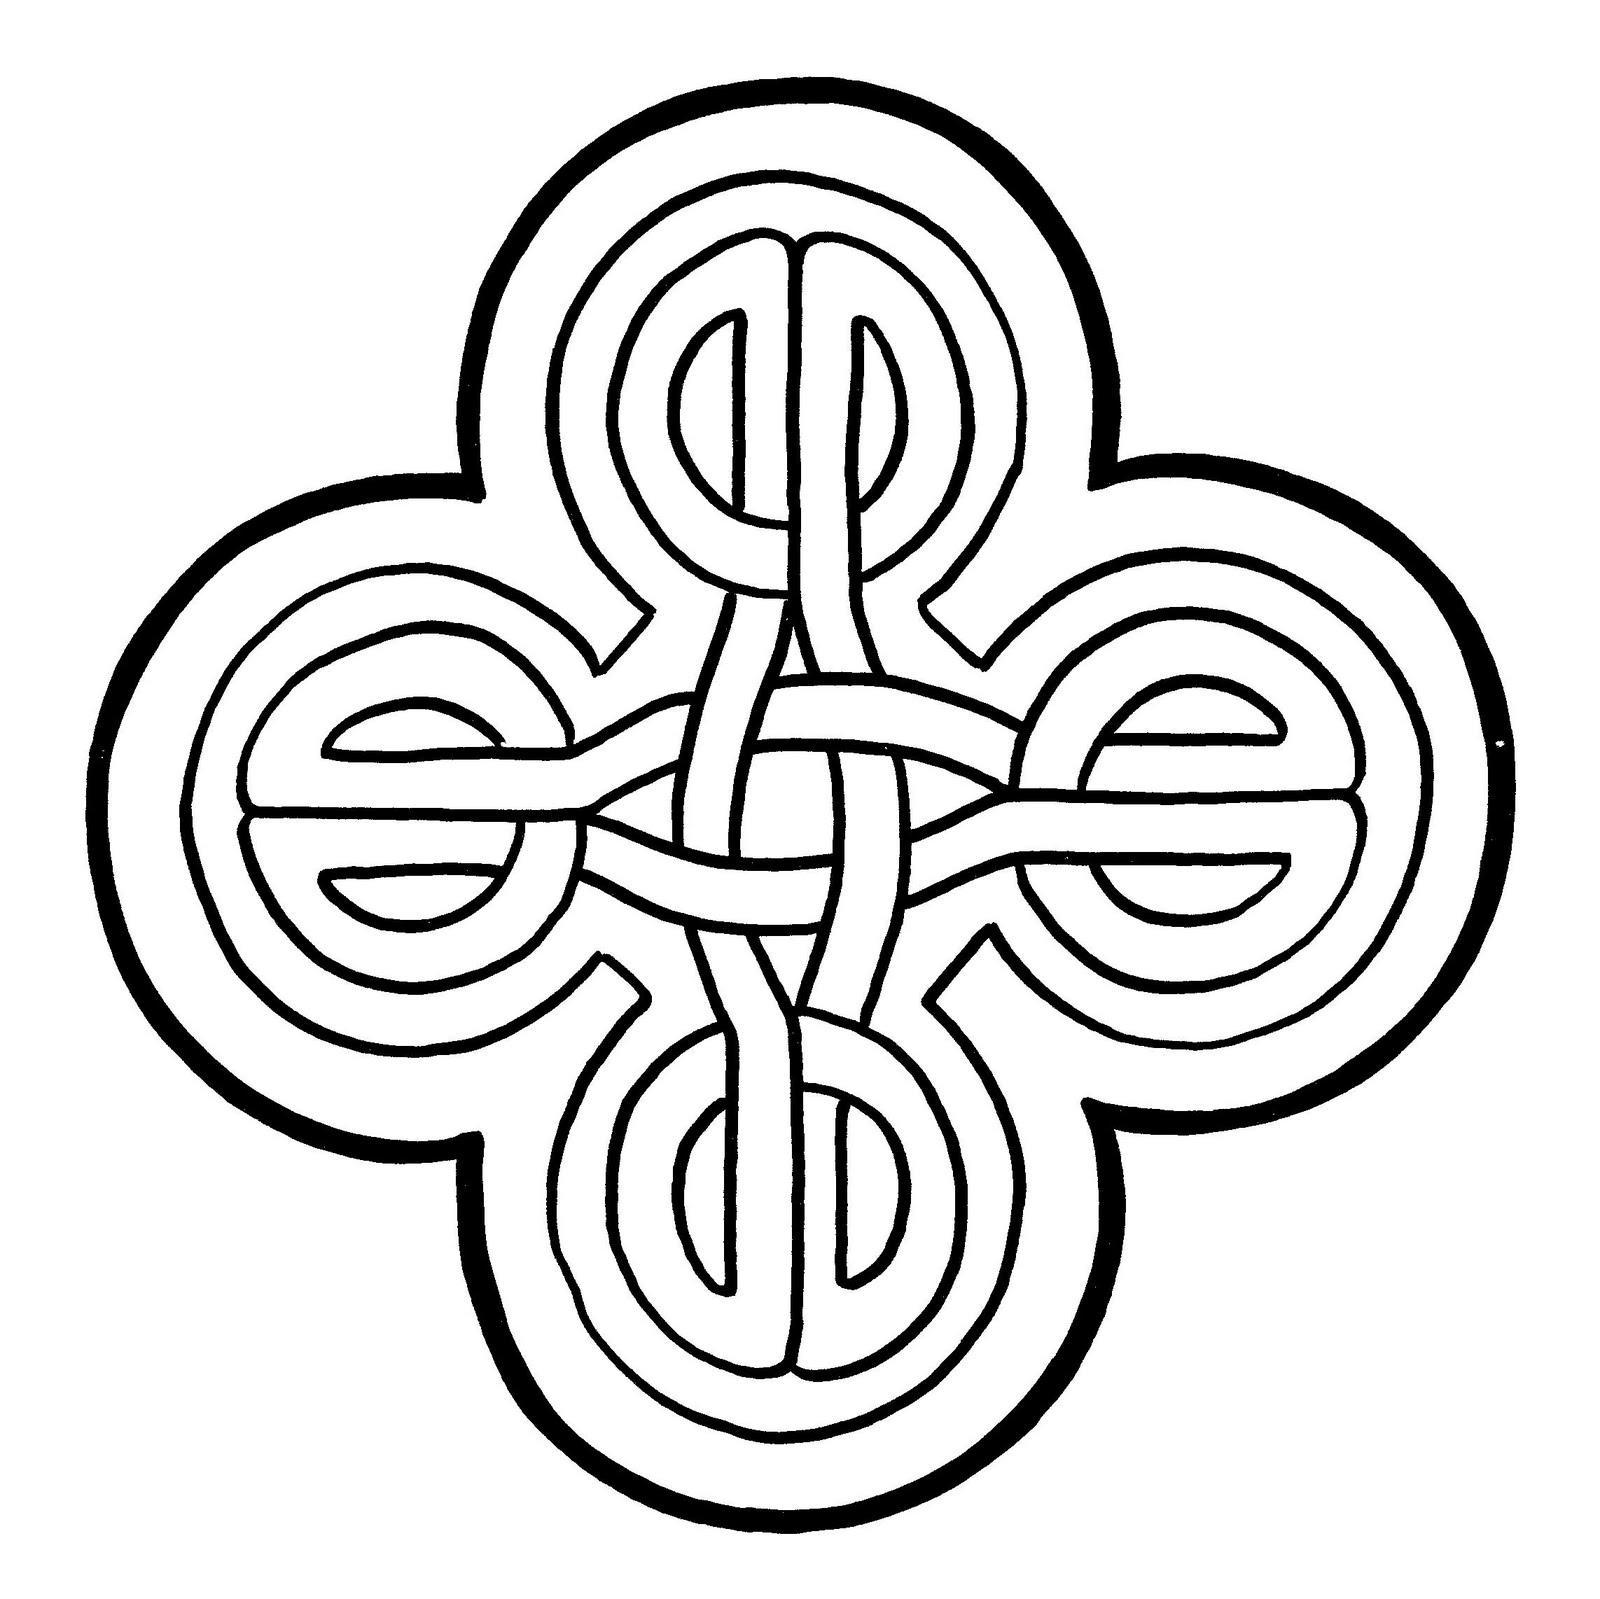 Lujoso Carta Celta Para Colorear Friso - Dibujos Para Colorear En ...